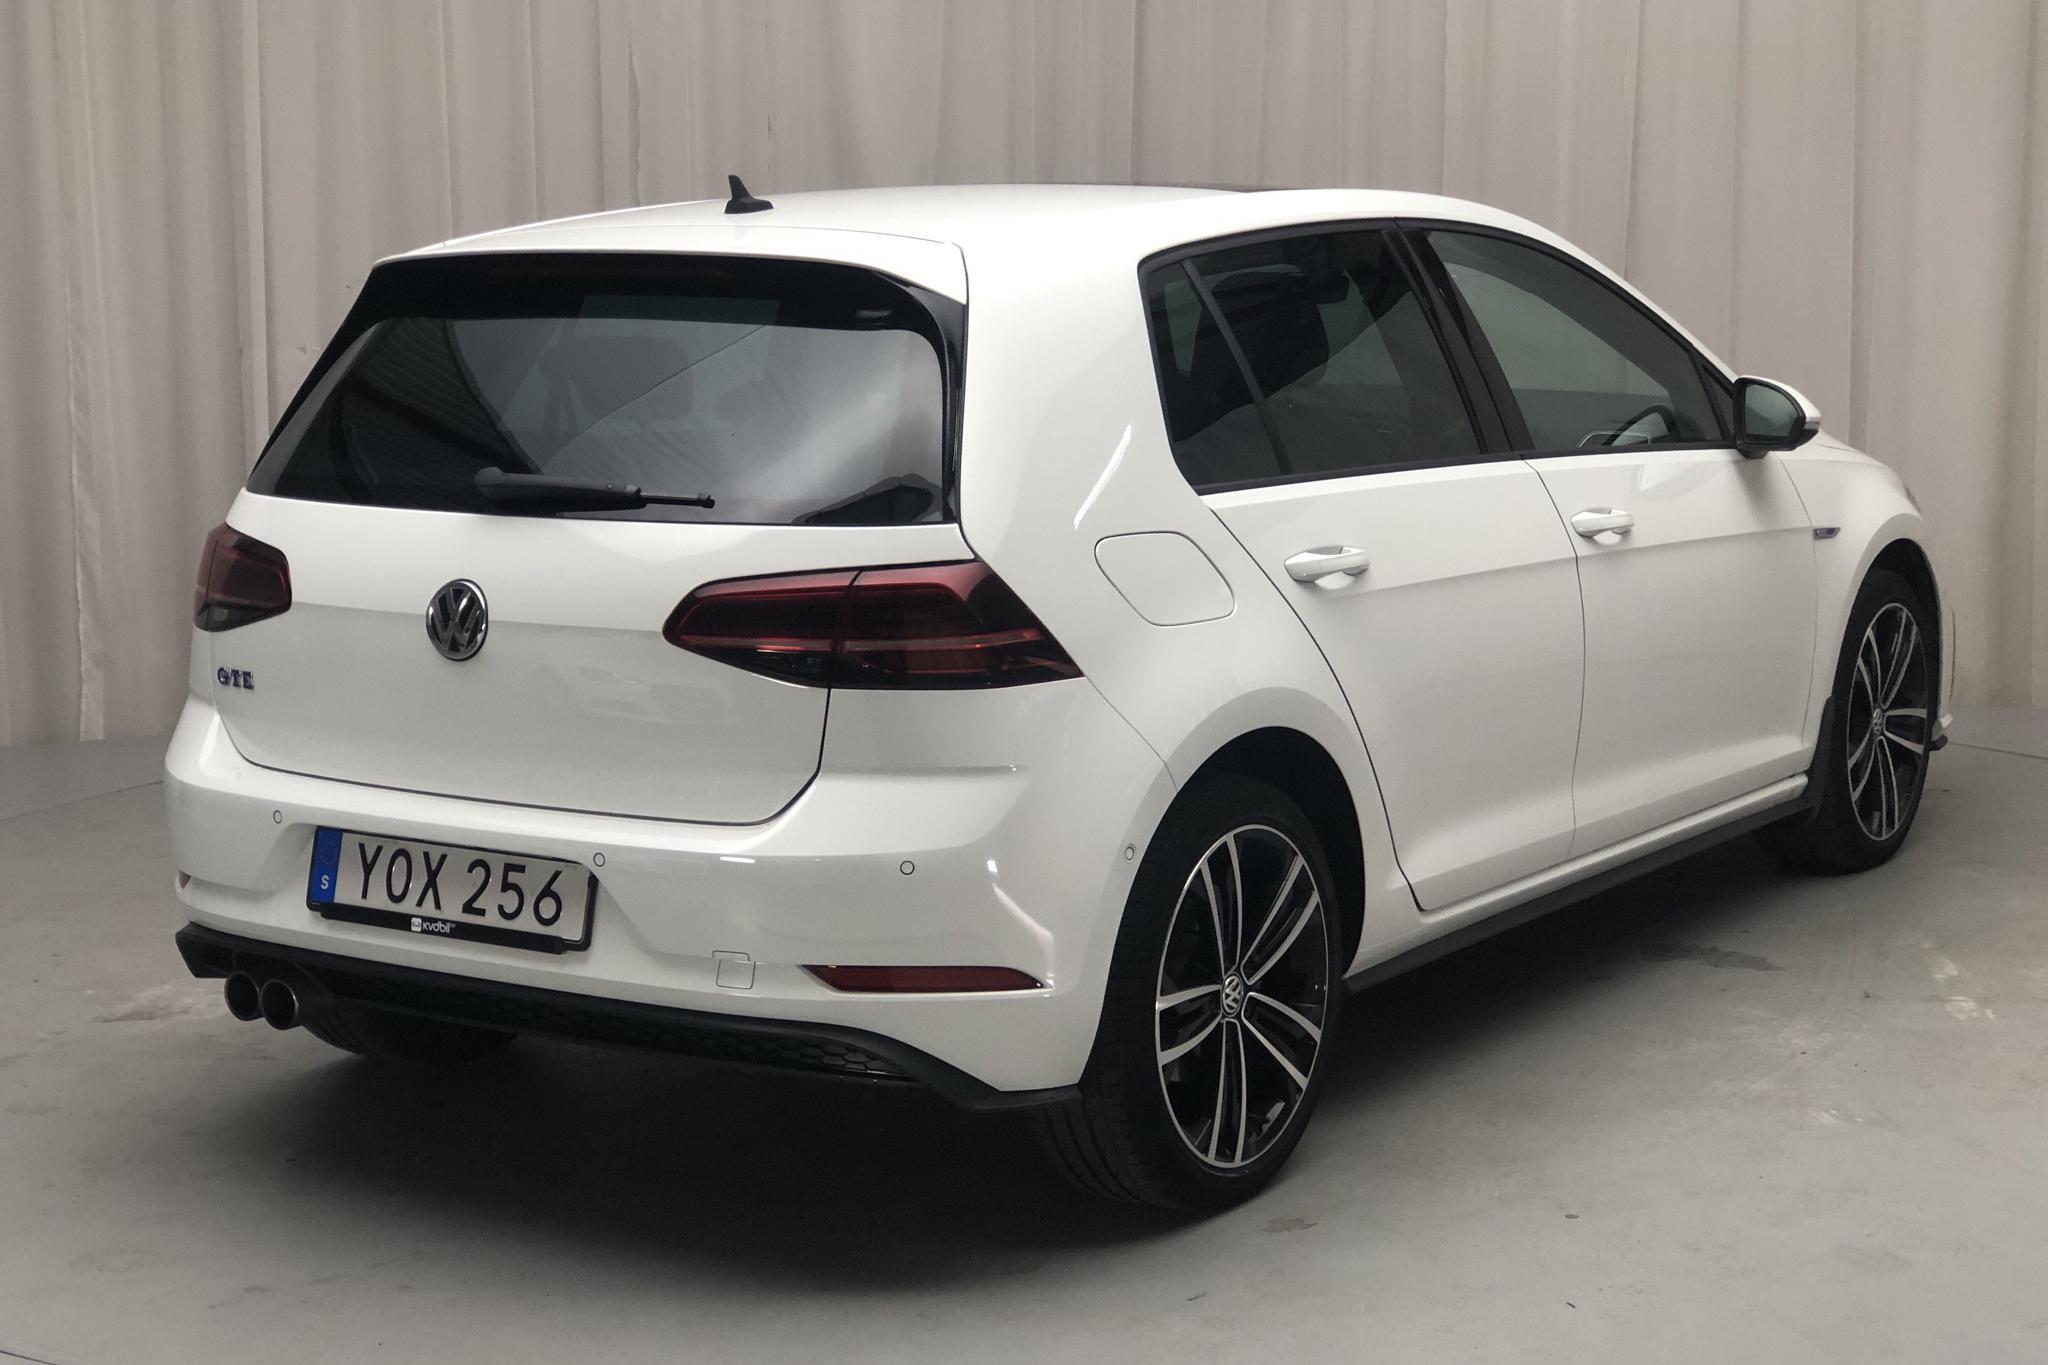 VW Golf VII GTE 5dr (204hk) - 47 940 km - Automatic - white - 2018